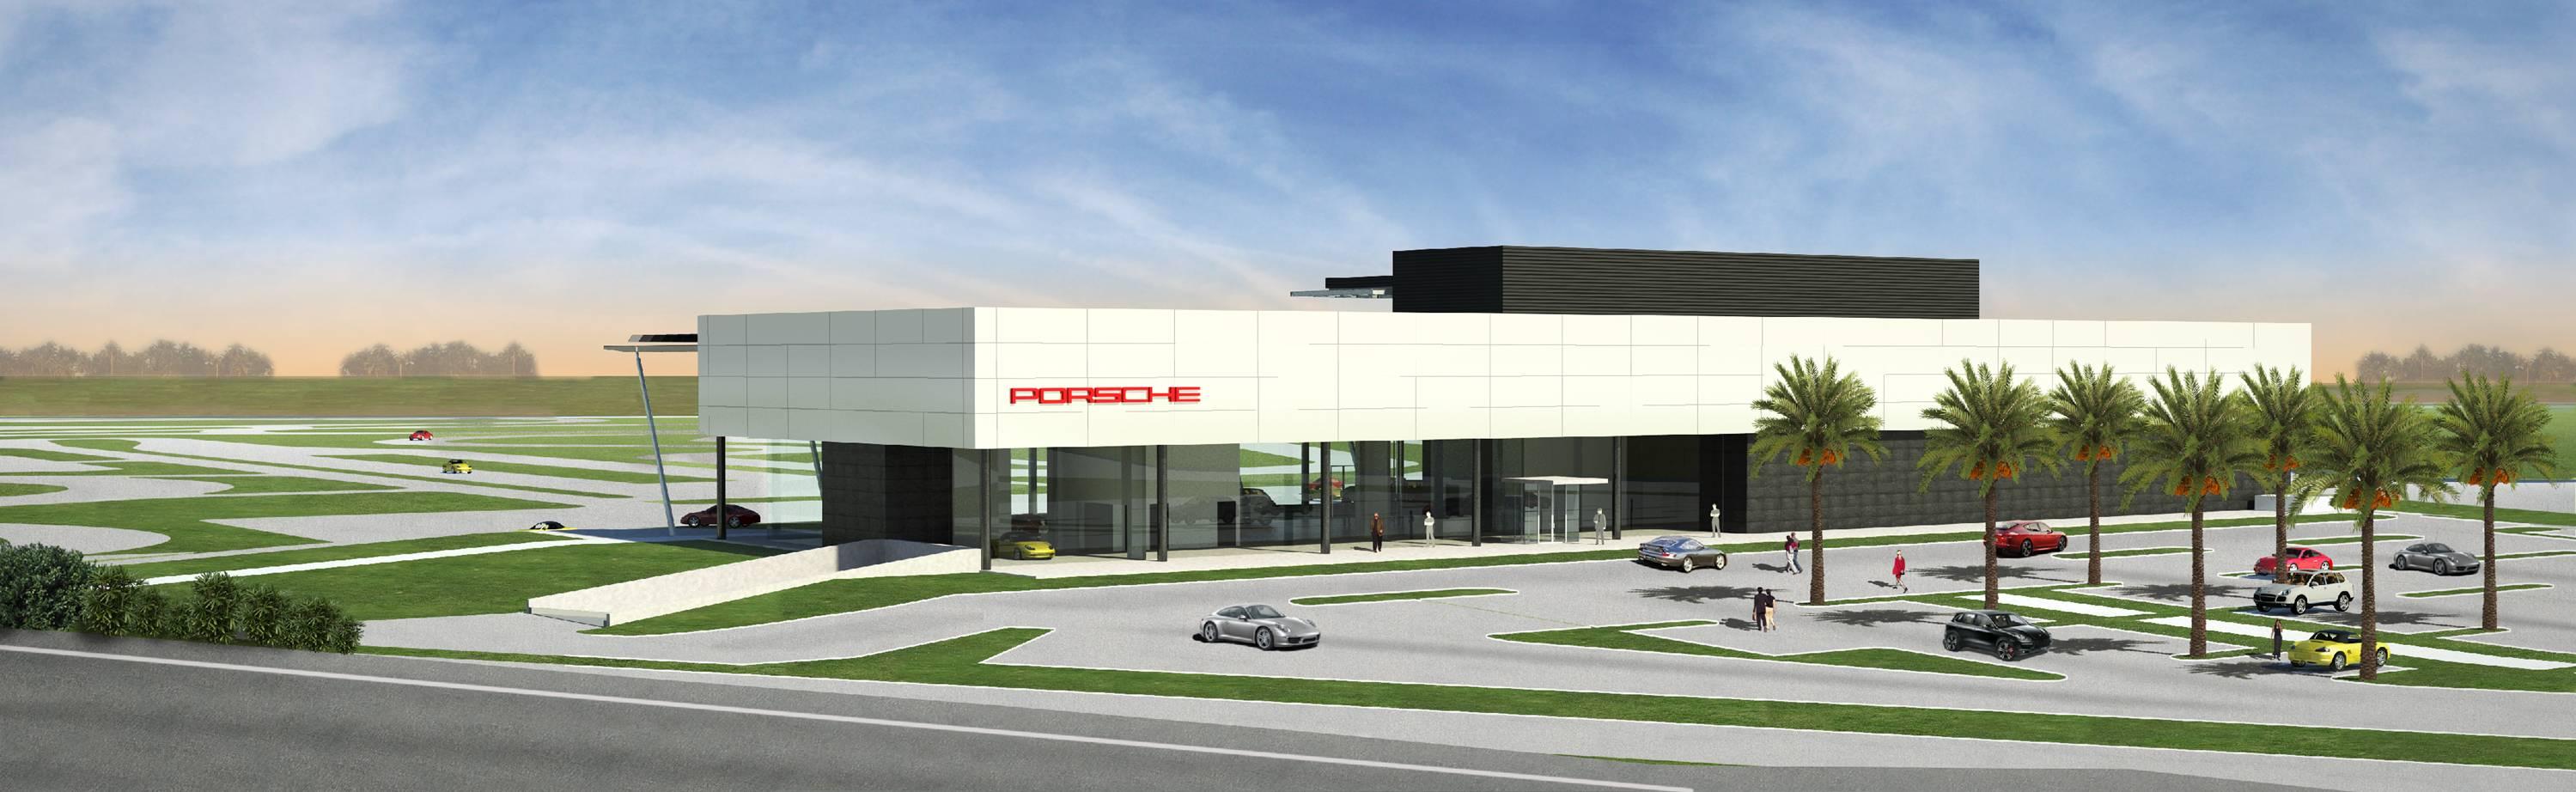 West Coast Porsche Experience Center Announced